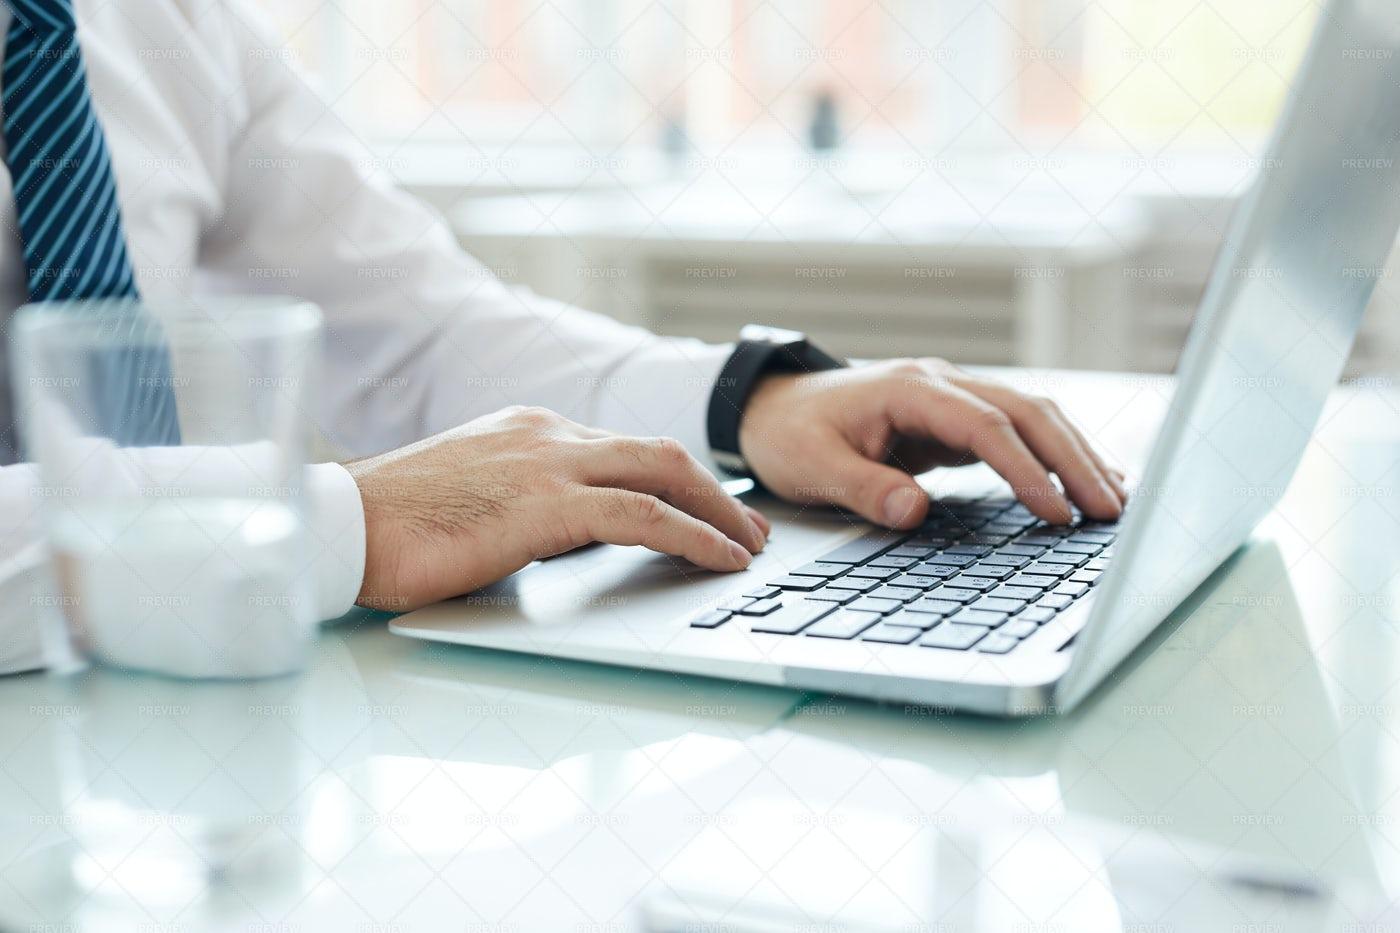 Using Laptop For Business Analysis: Stock Photos